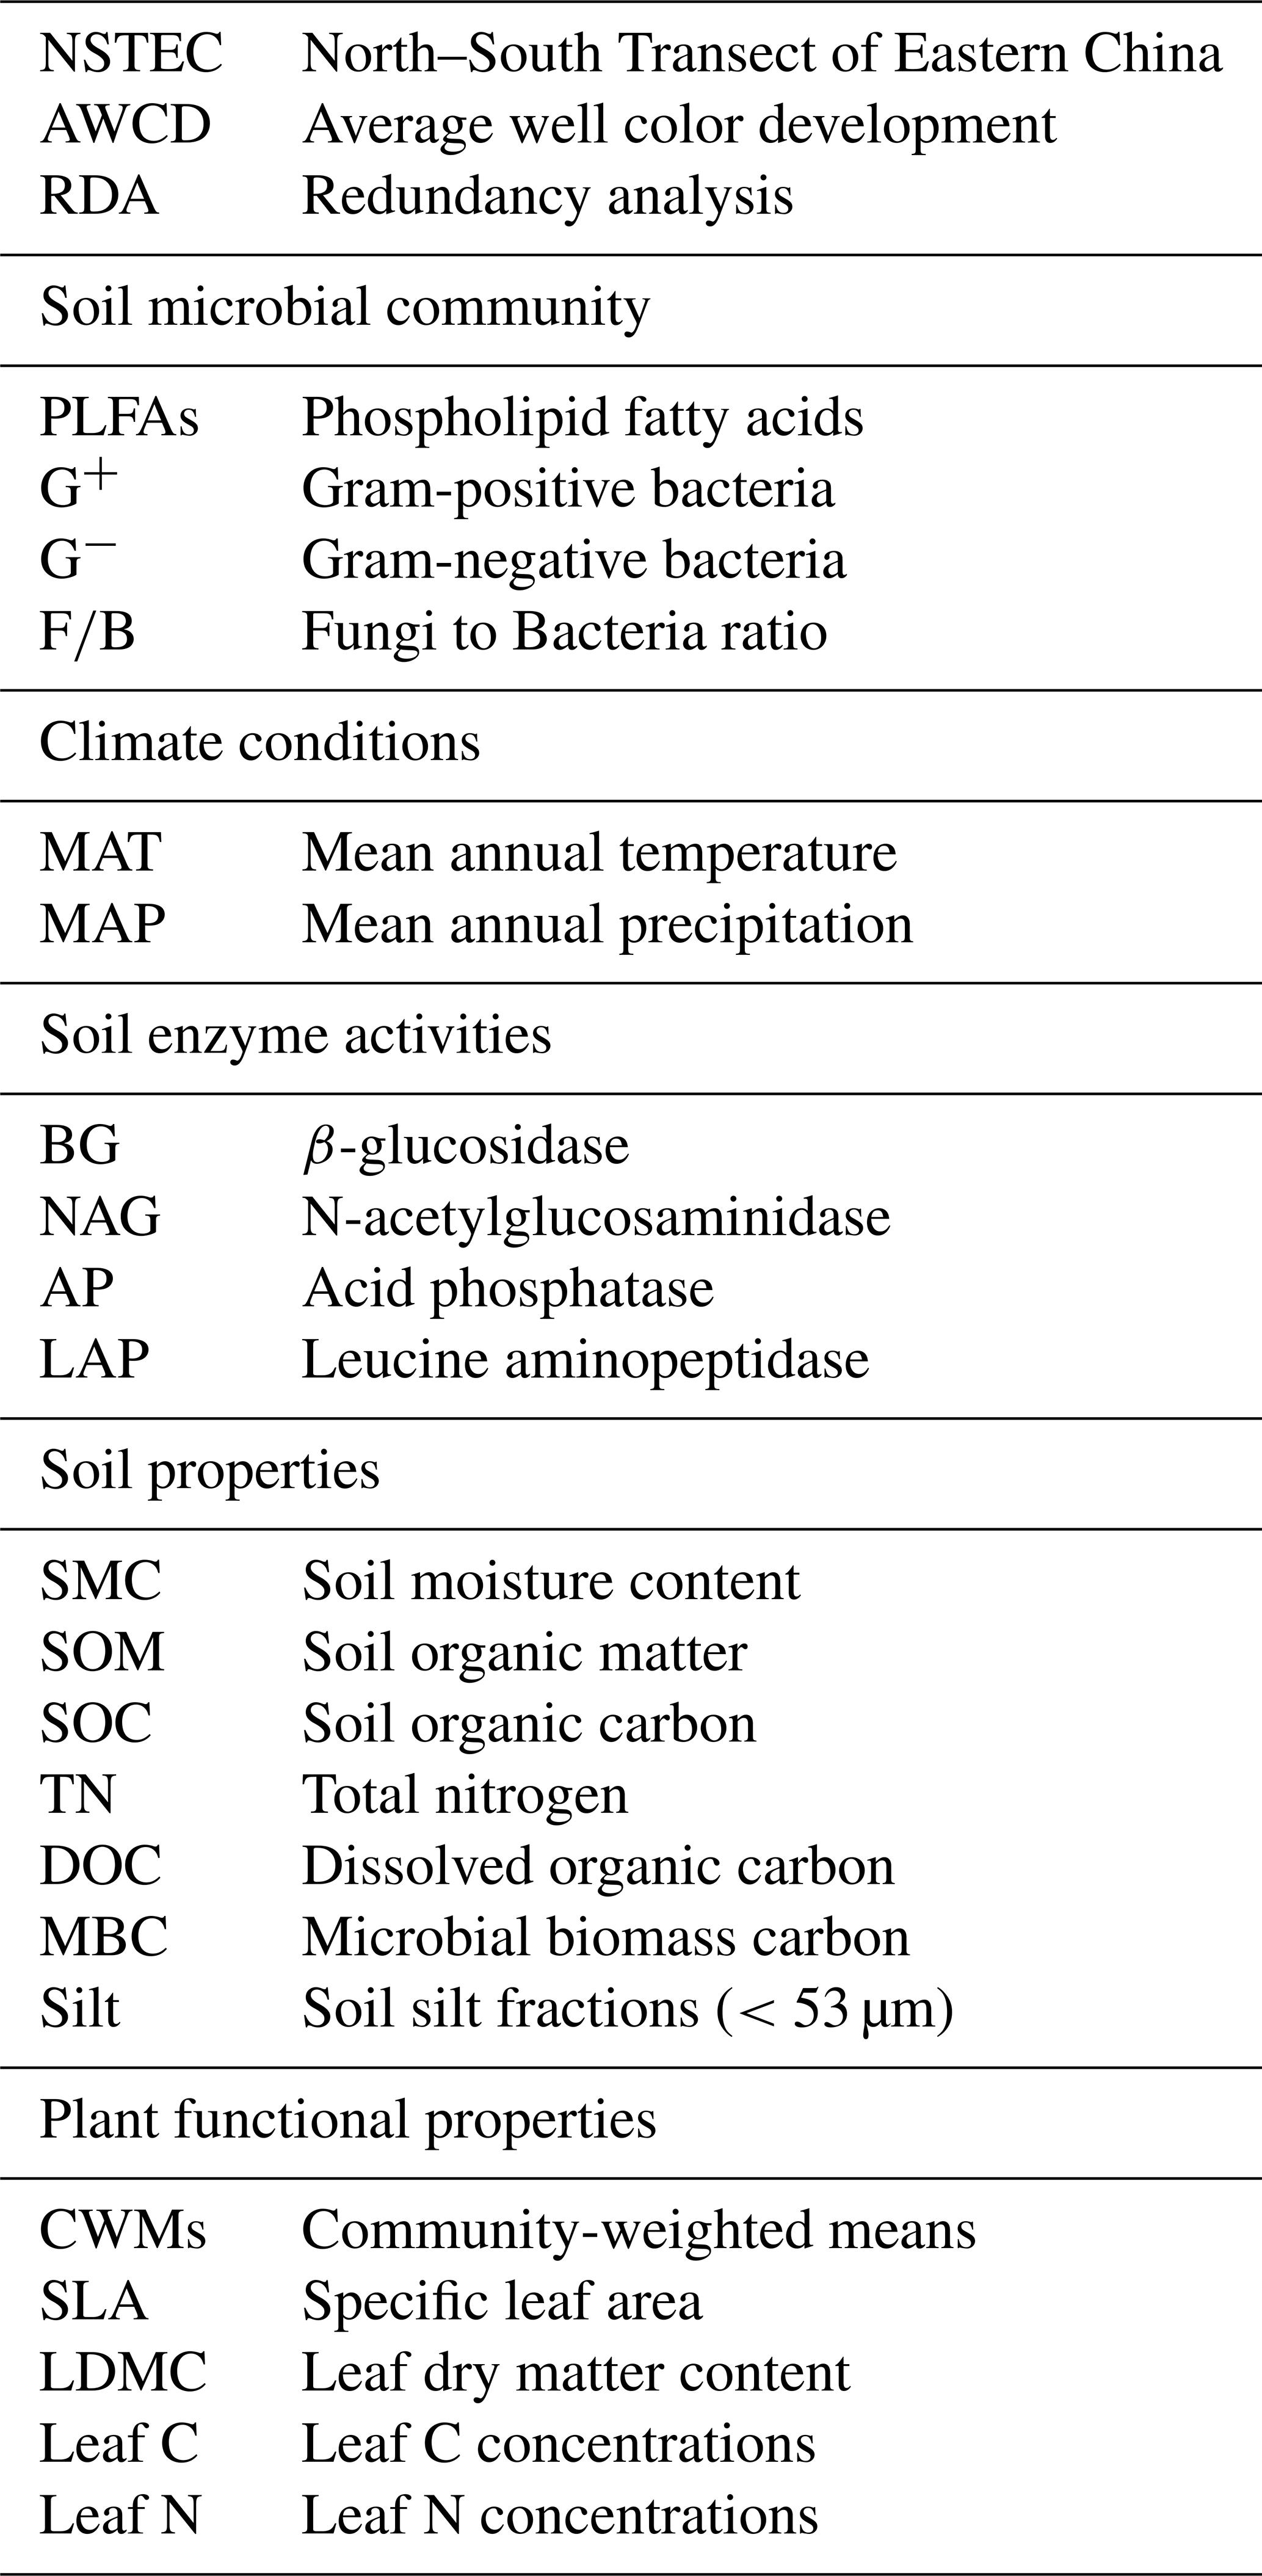 BG - Plant functional traits determine latitudinal